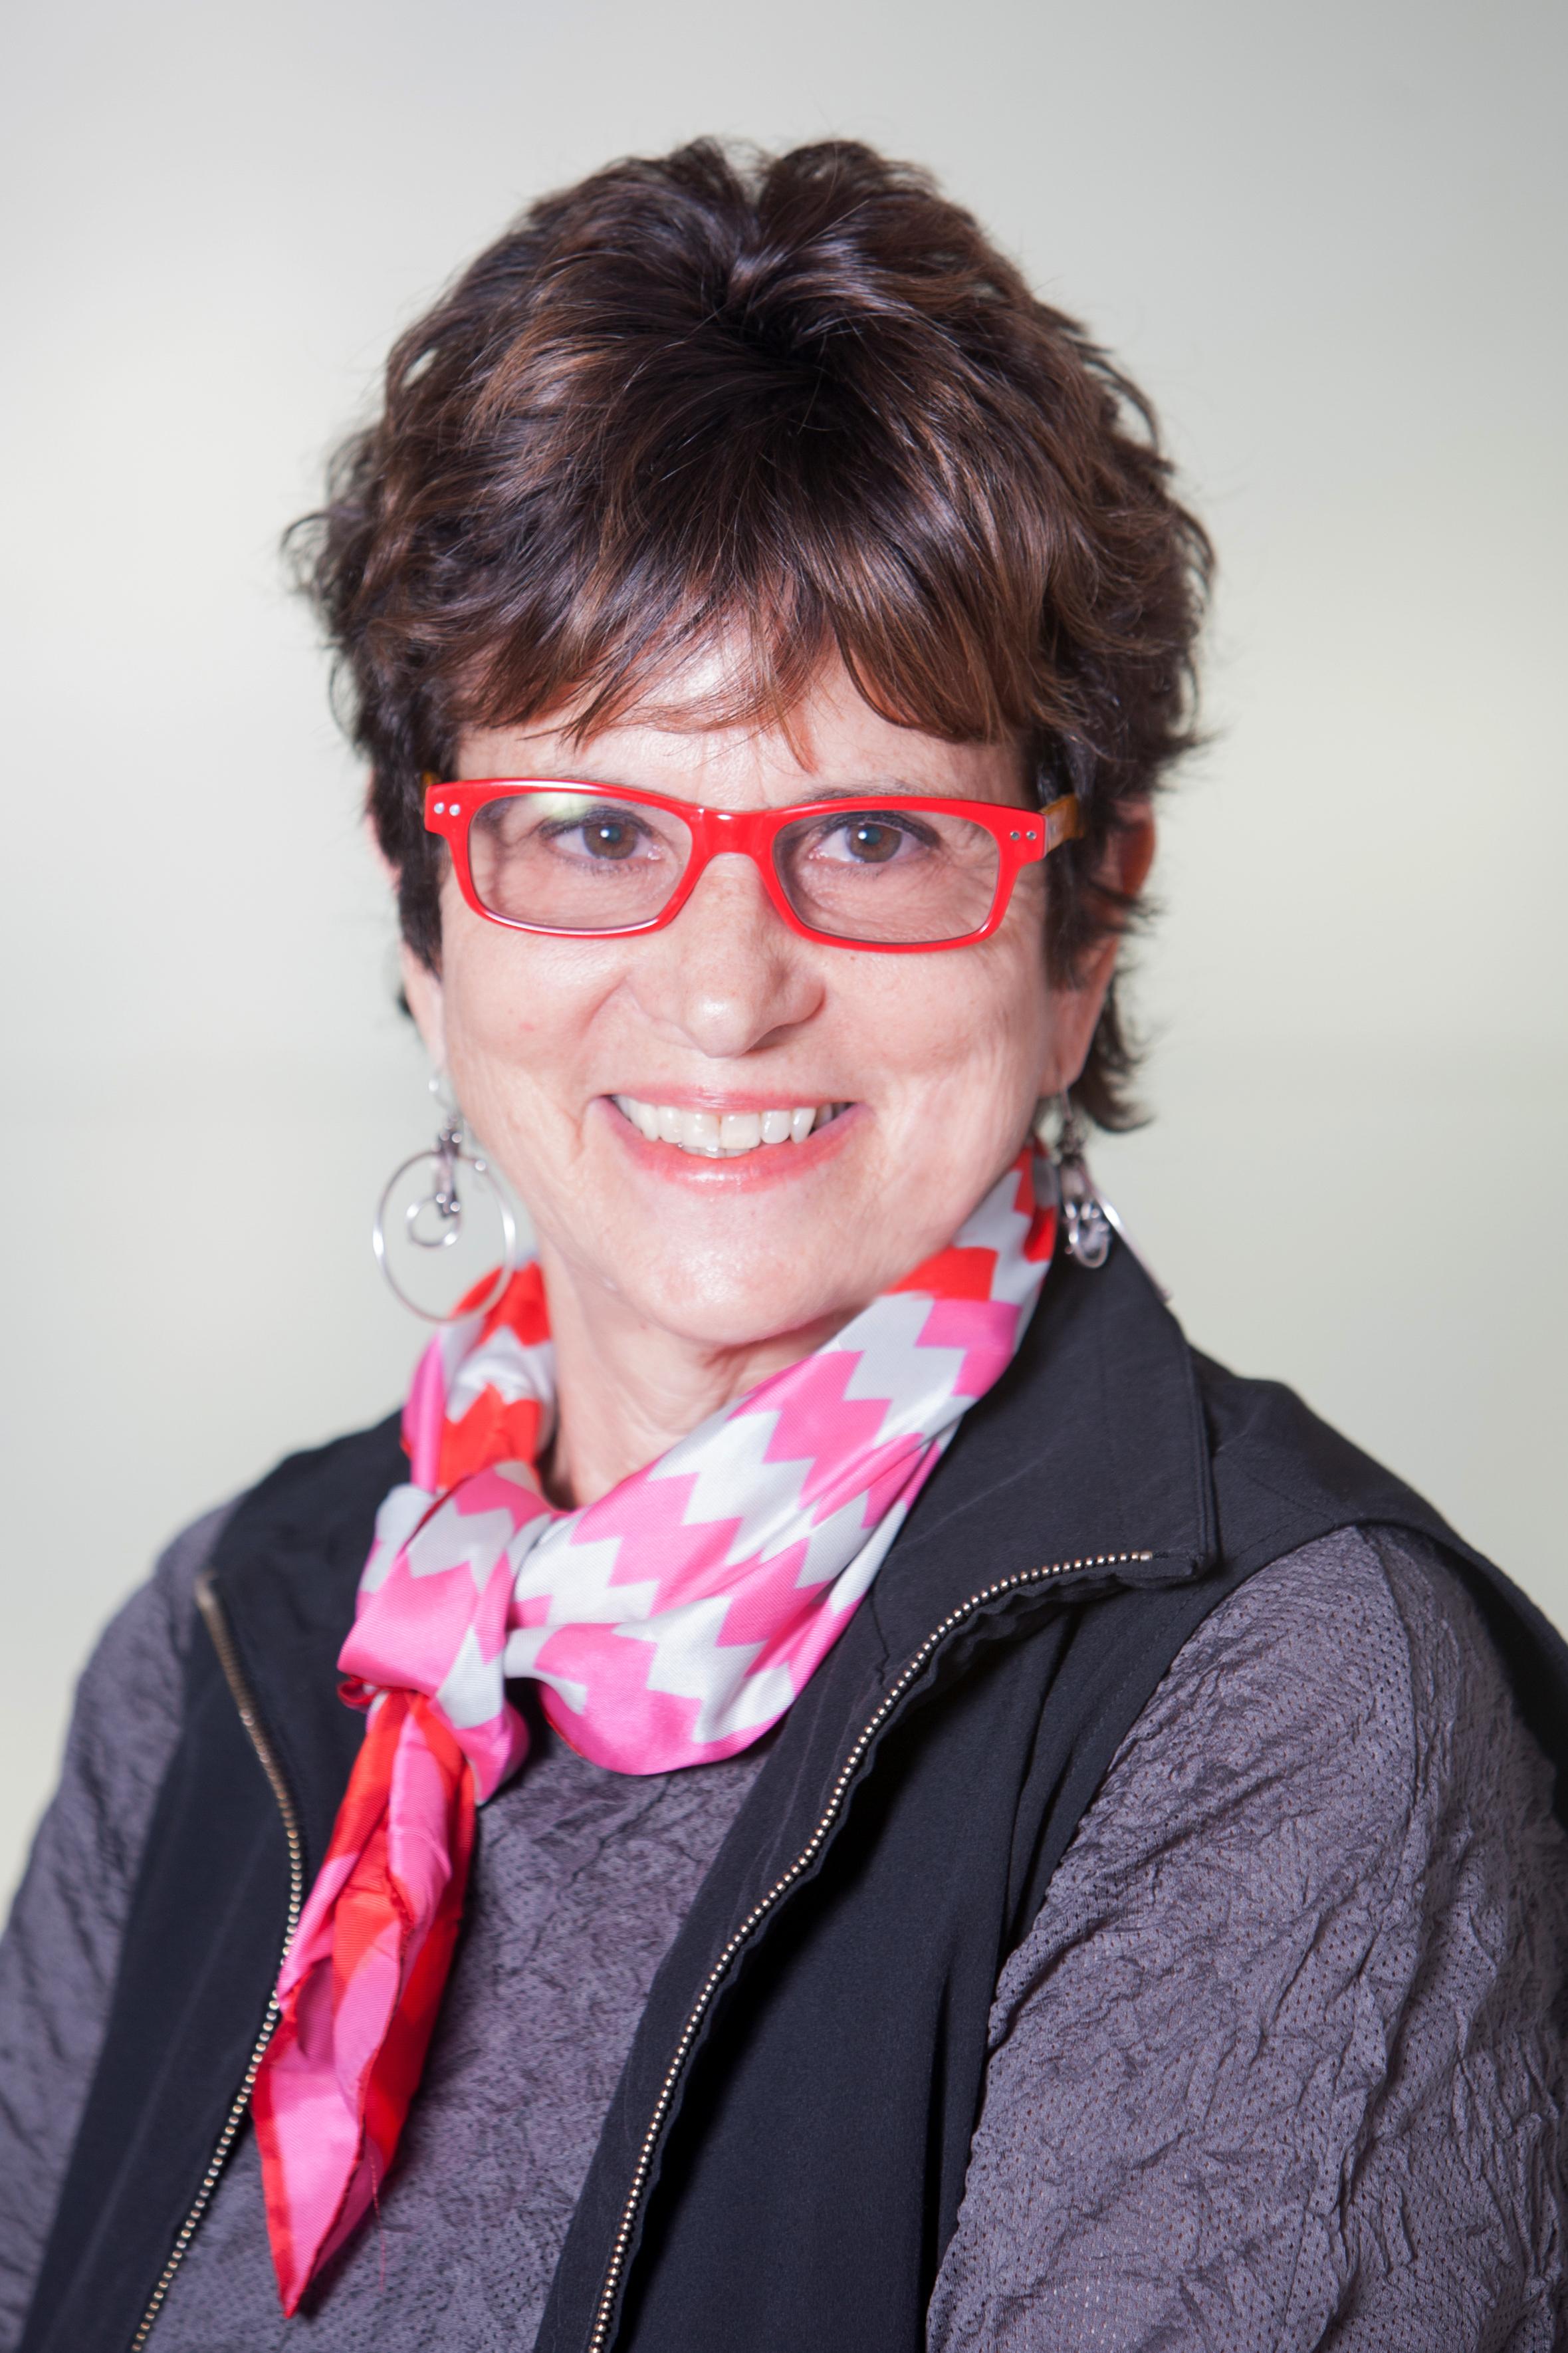 Francie Bishop Good, artist and arts collector